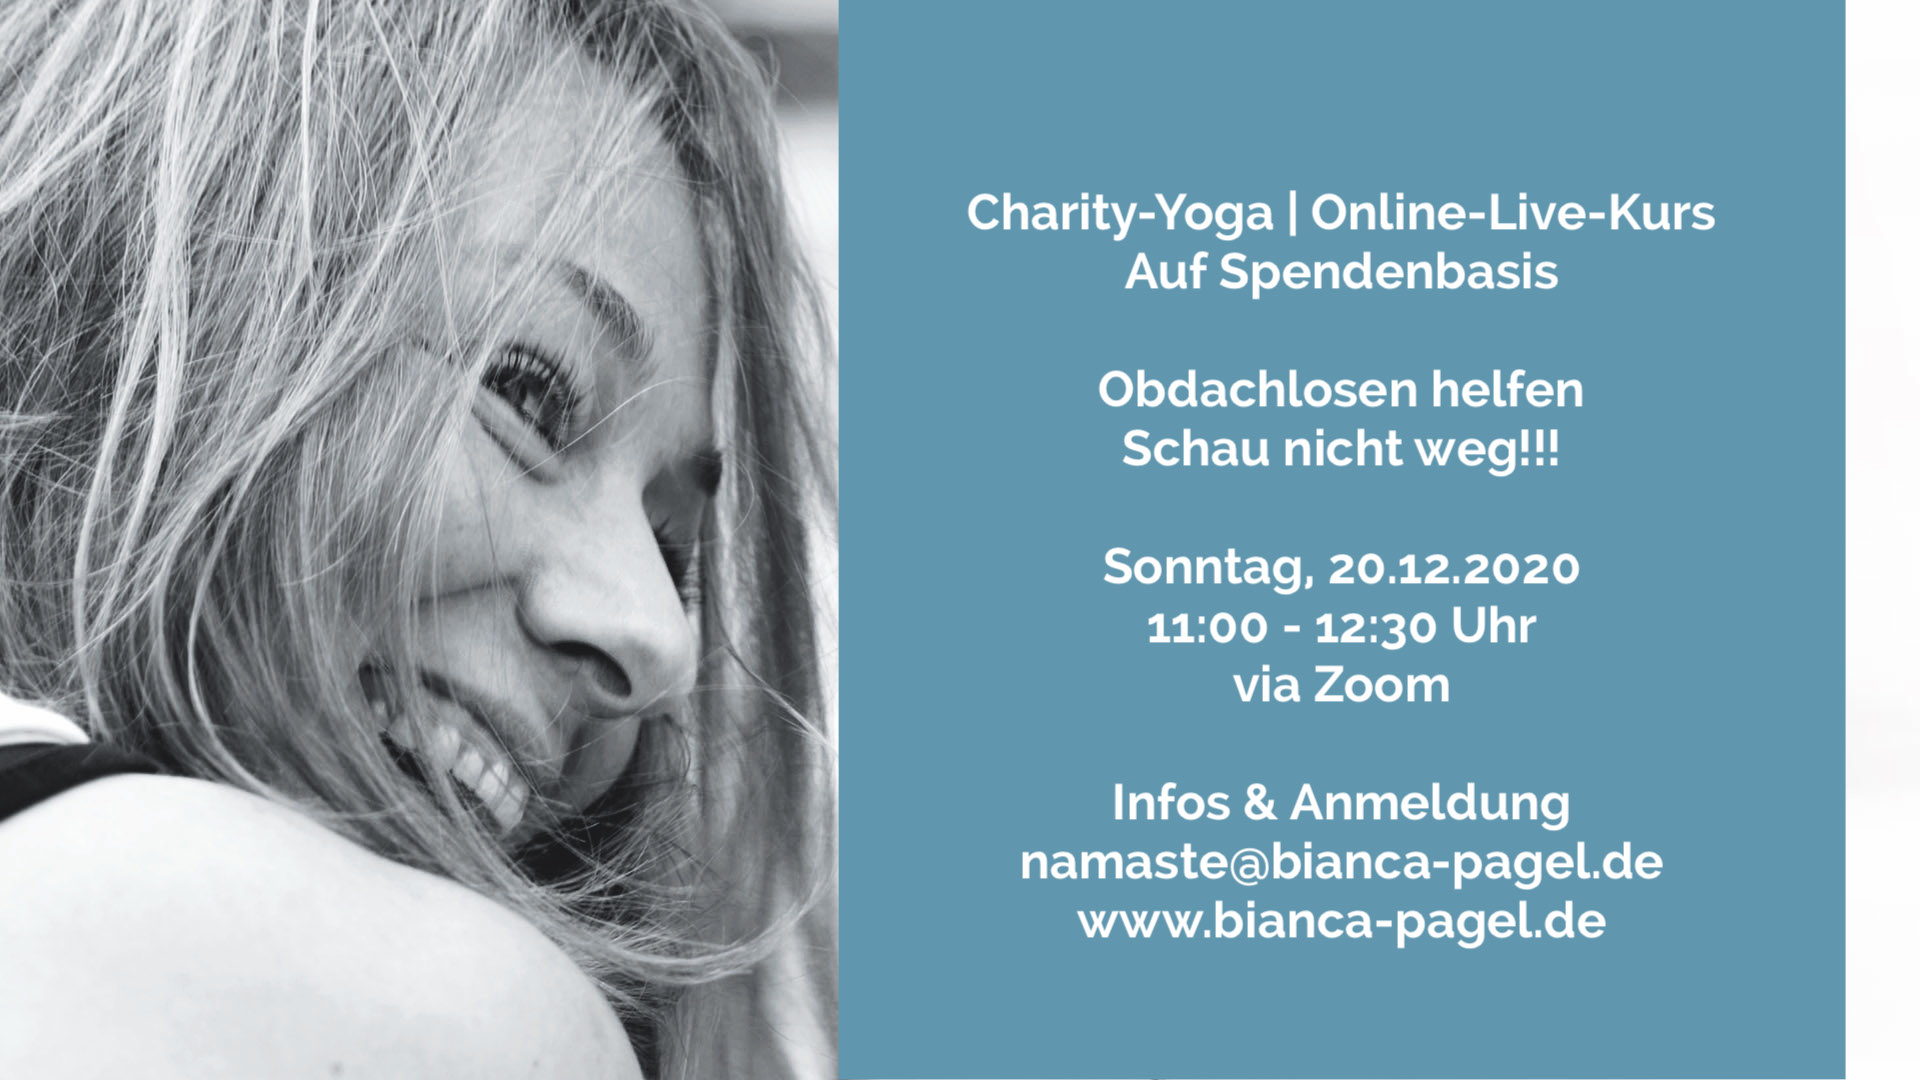 Yoga Feel-Good Hamburg Volksdorf Ahrensburg Entspannung Achtsamkeit Gesundheit Bianca Pagel Schau´nicht weg e.V. Charity-Yoga Online-Live-Kurs